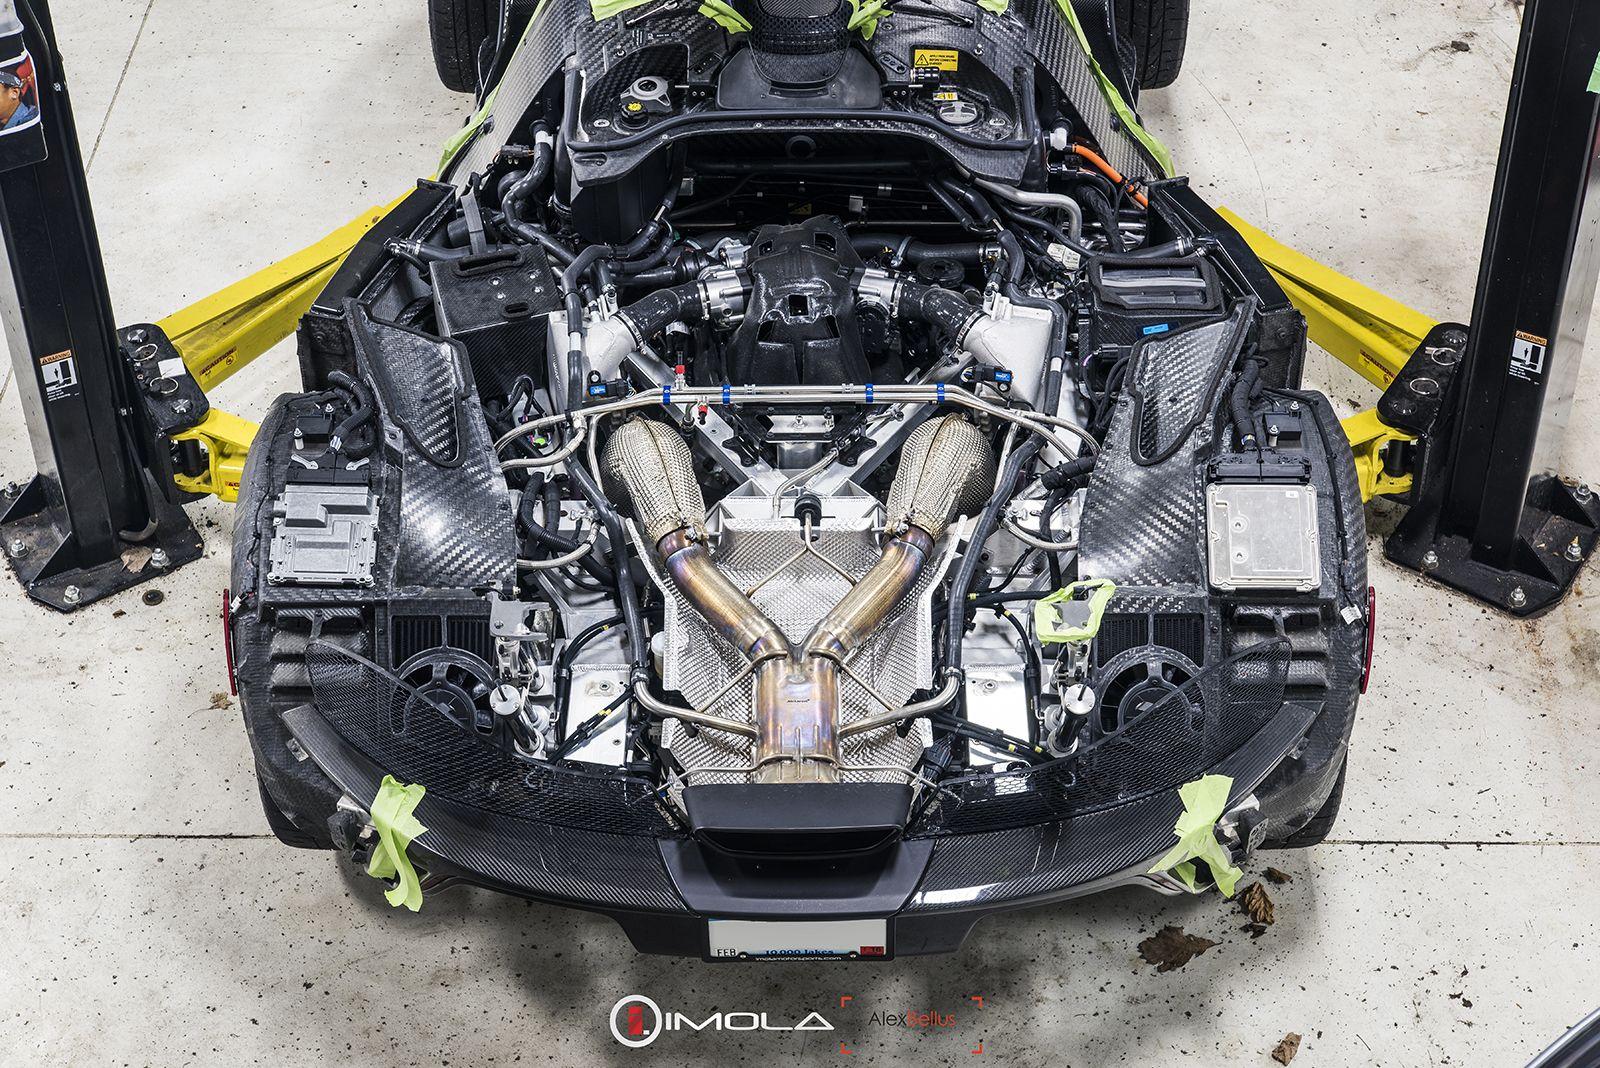 Mclaren P1 Engine Diagram - Fusebox and Wiring Diagram sweat -  sweat.radioe.it | Hybrid Engine Diagram Of Mclaren S |  | diagram database - radioe.it